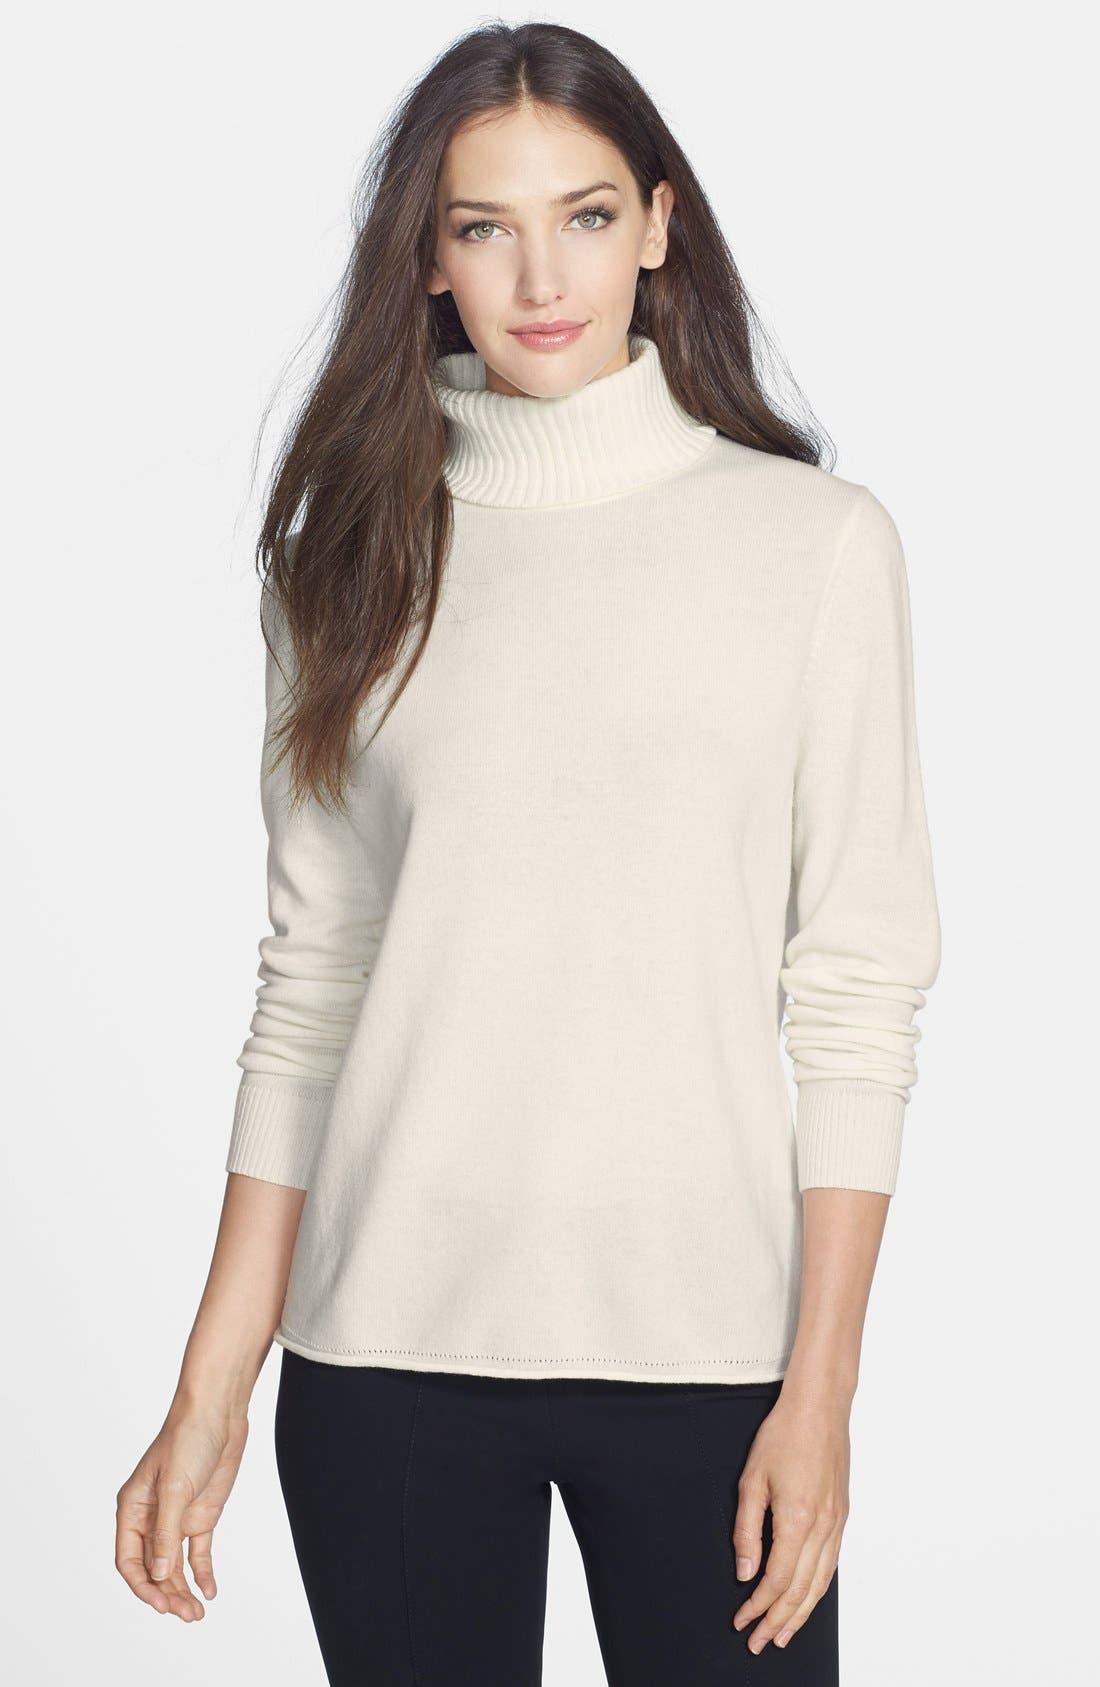 Alternate Image 1 Selected - Lafayette 148 New York Cashmere Turtleneck Sweater